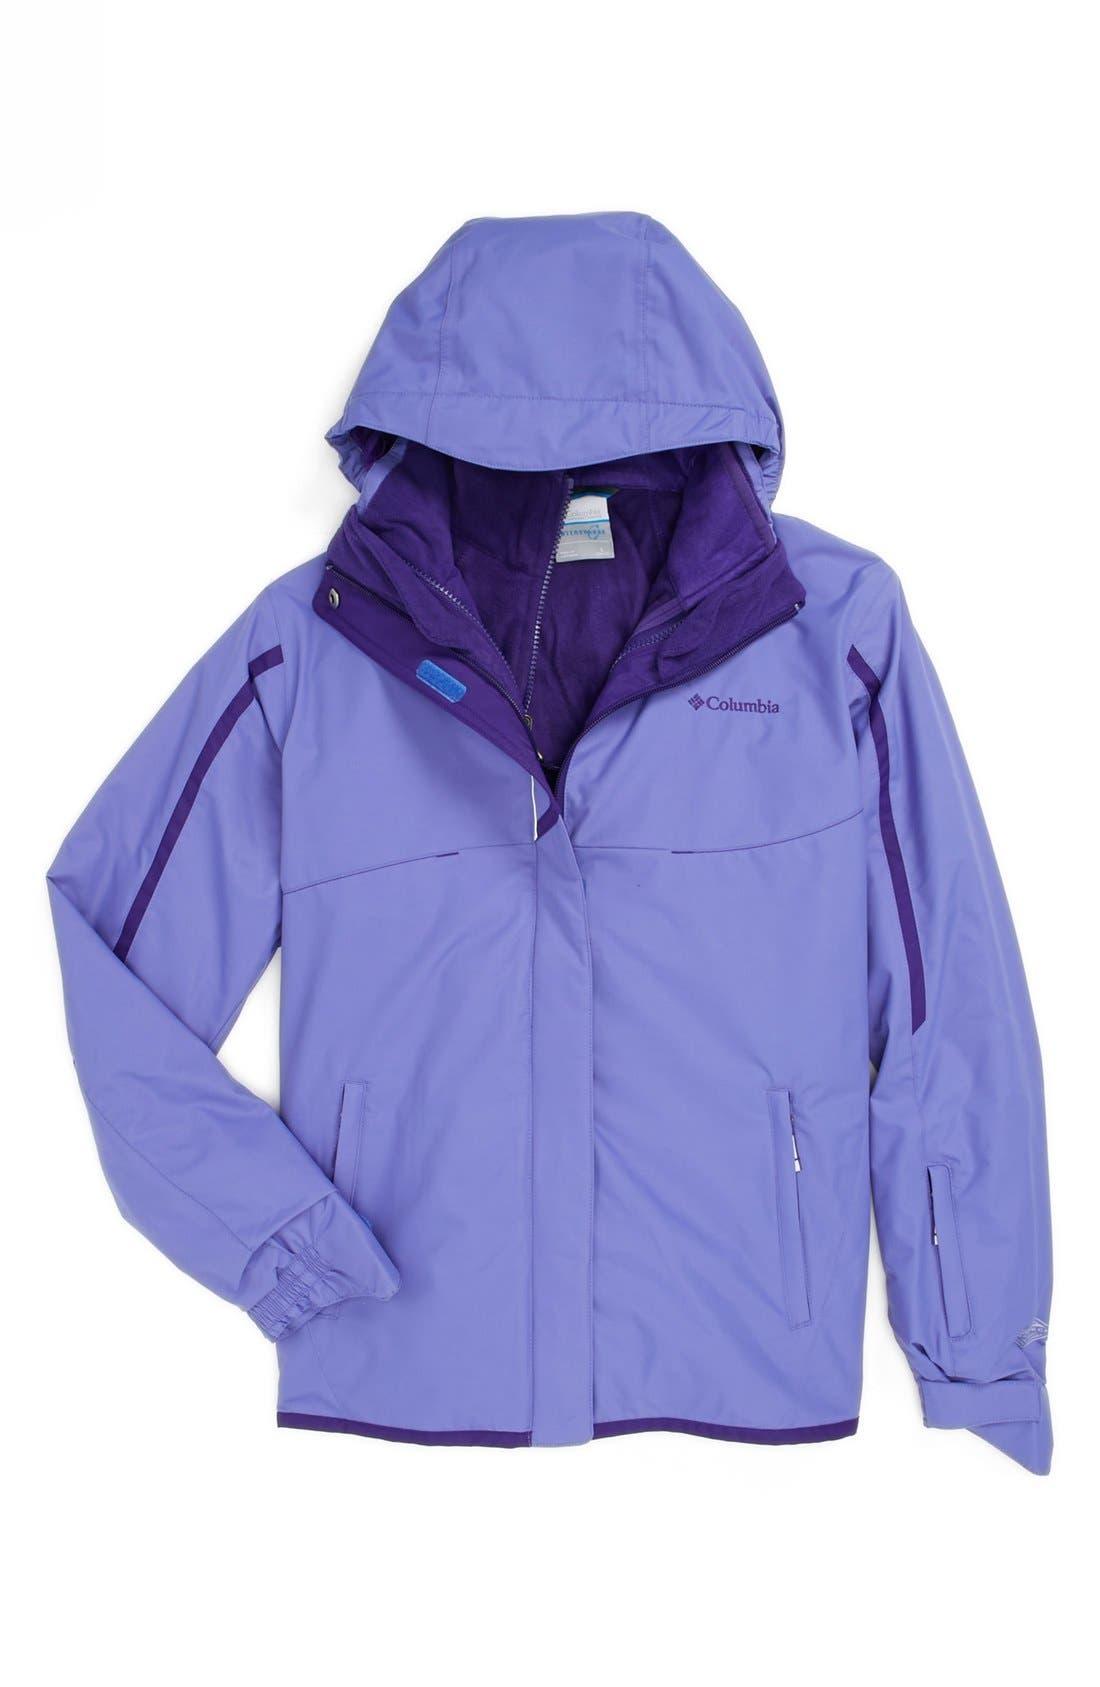 Alternate Image 1 Selected - Columbia 'Bugaboo Interchange' Waterproof 3-in-1 Jacket (Big Girls)